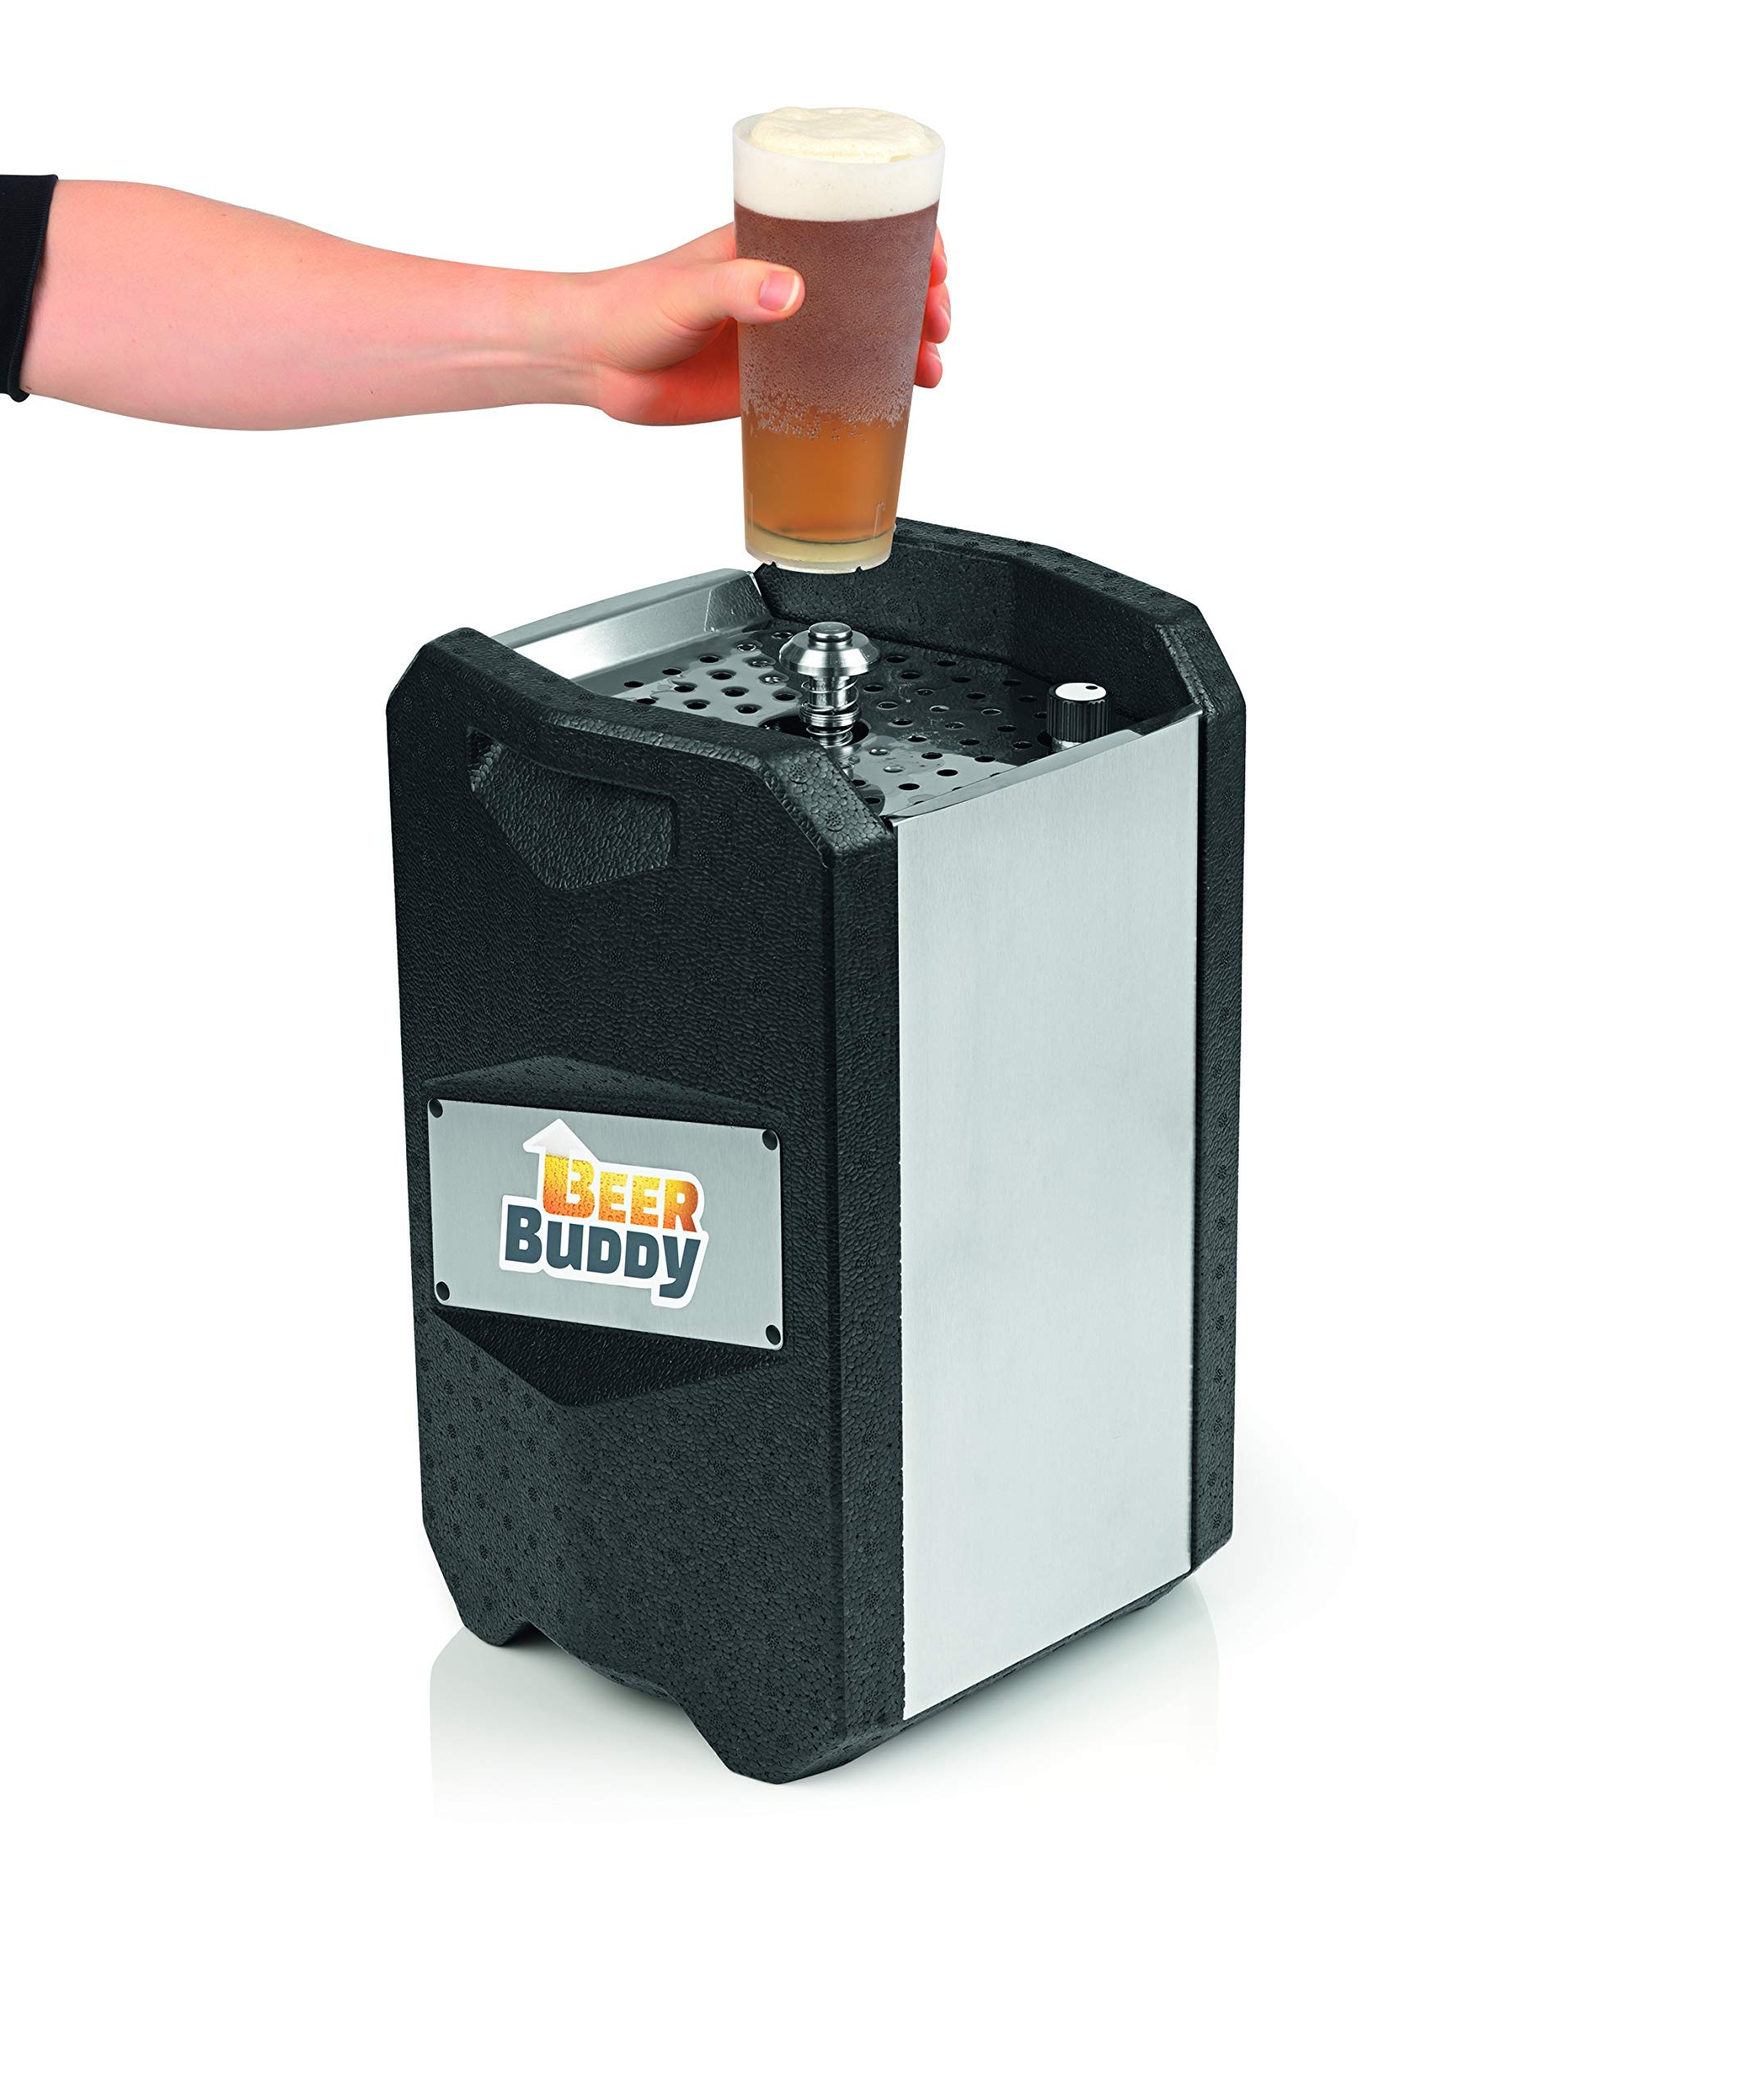 81ZfvATbzwL - Beer Buddy Version 2.0 latest version. Bottoms Up Beer Tap for 5 Litre Party Barrels